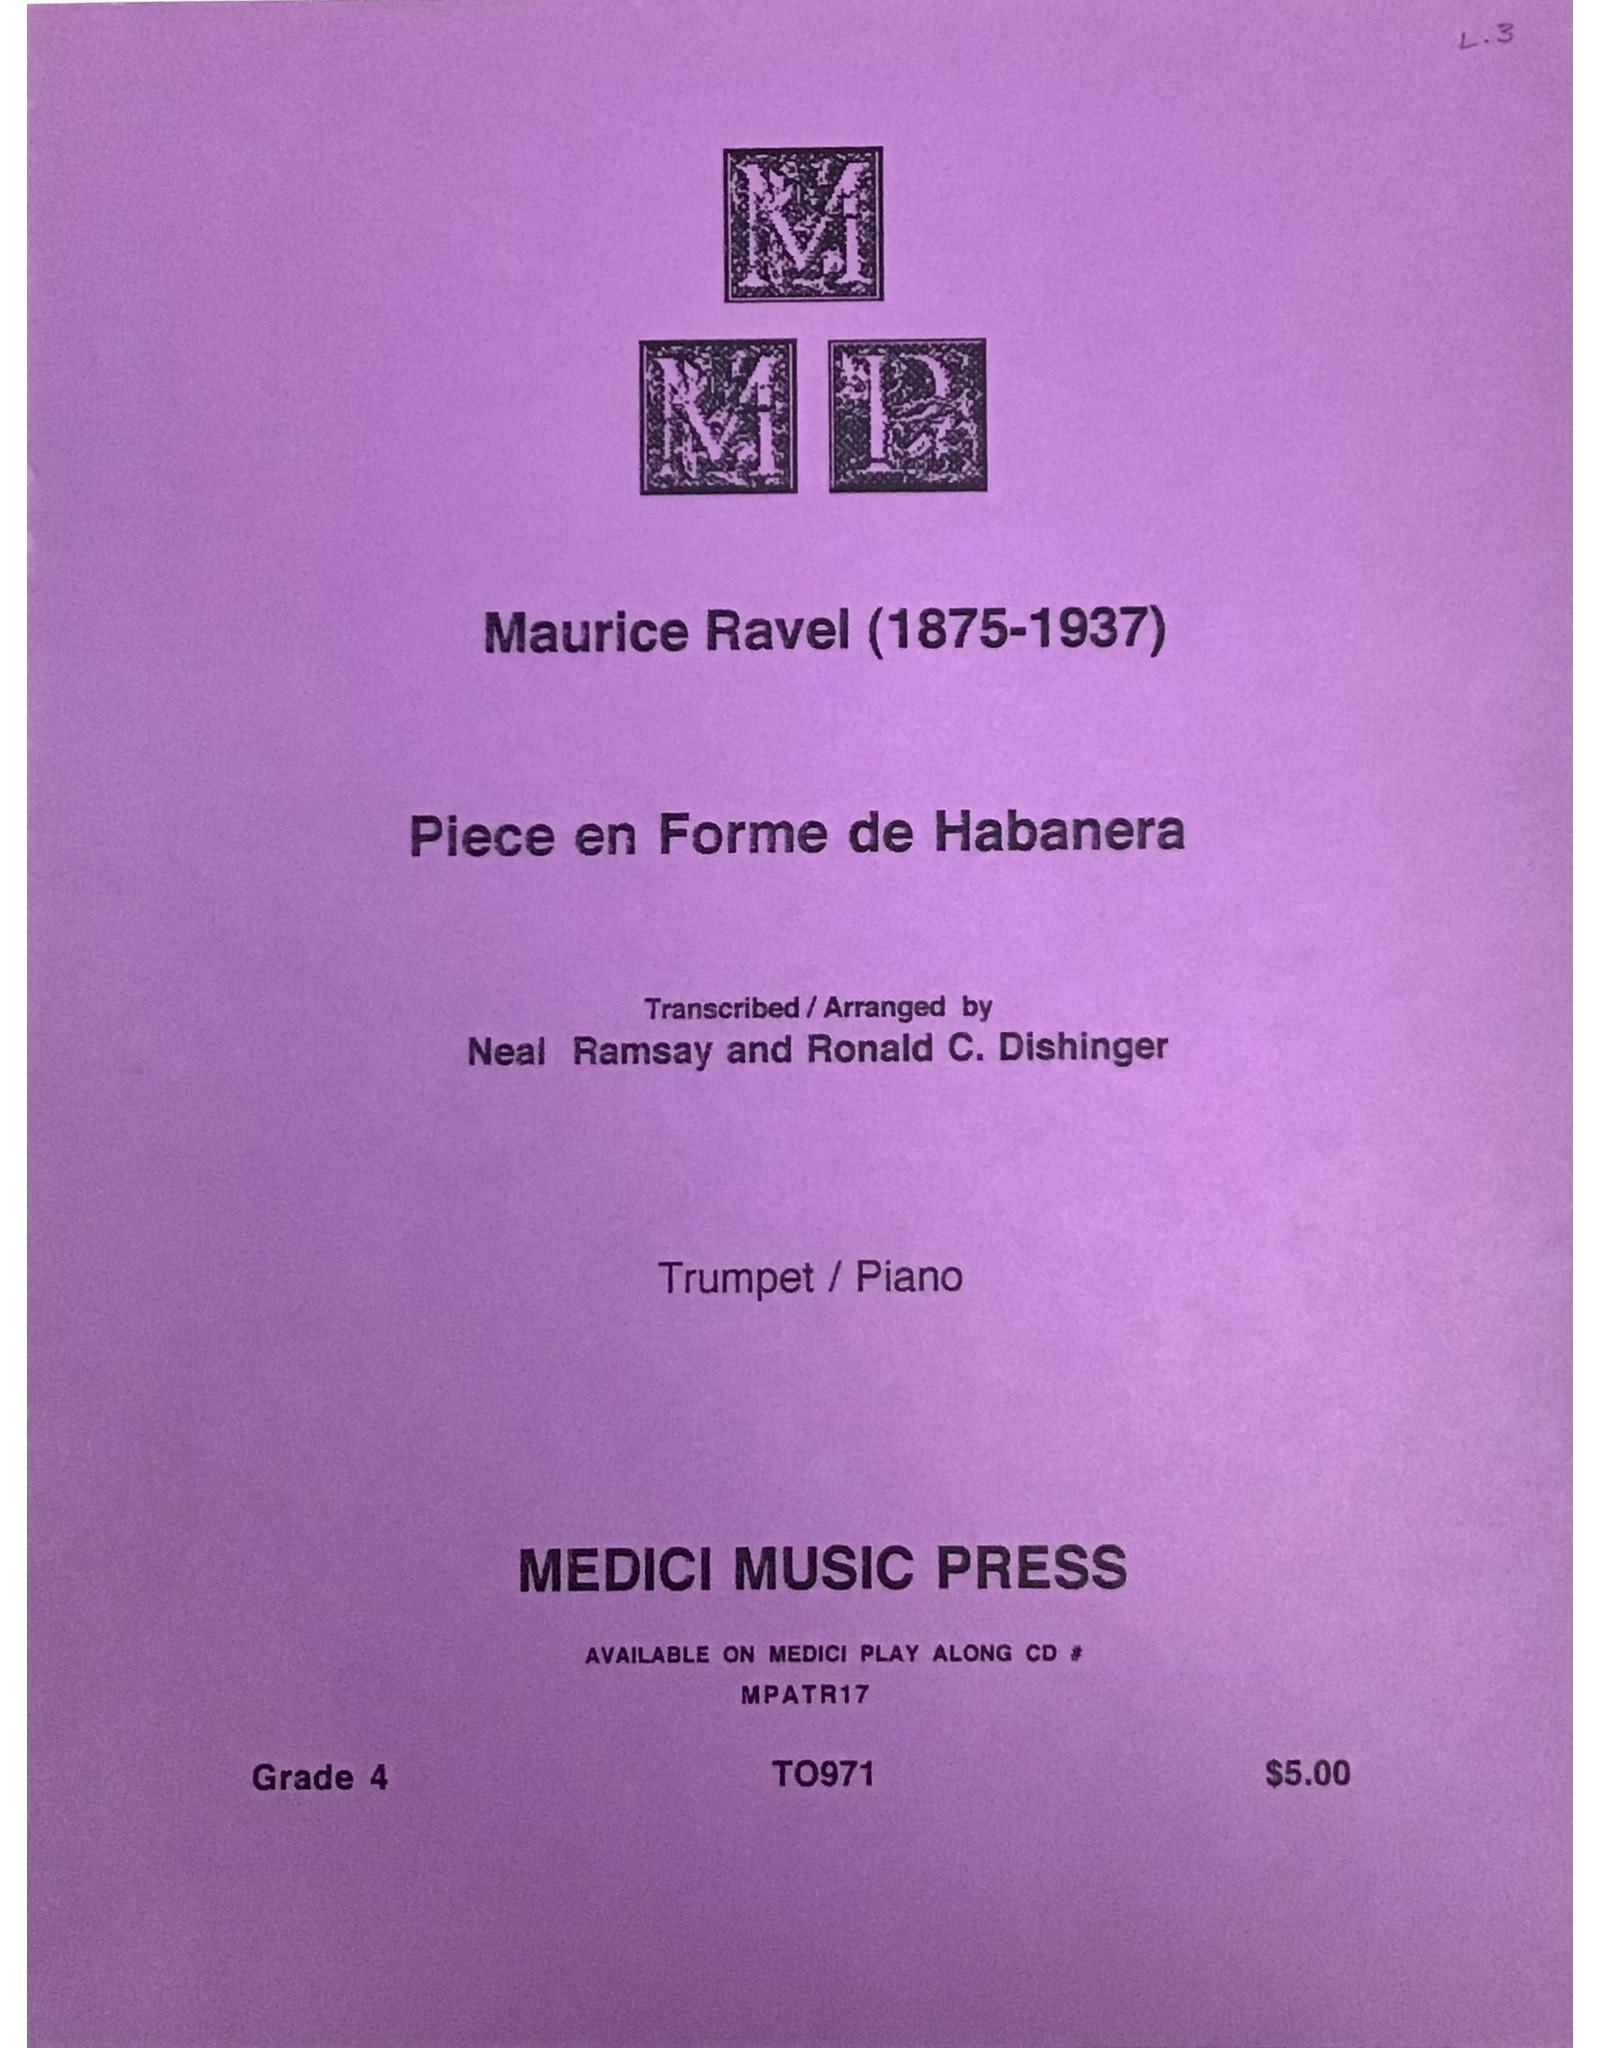 Medici Music Press Ravel - Piece en Forme de Habanera - Trumpet